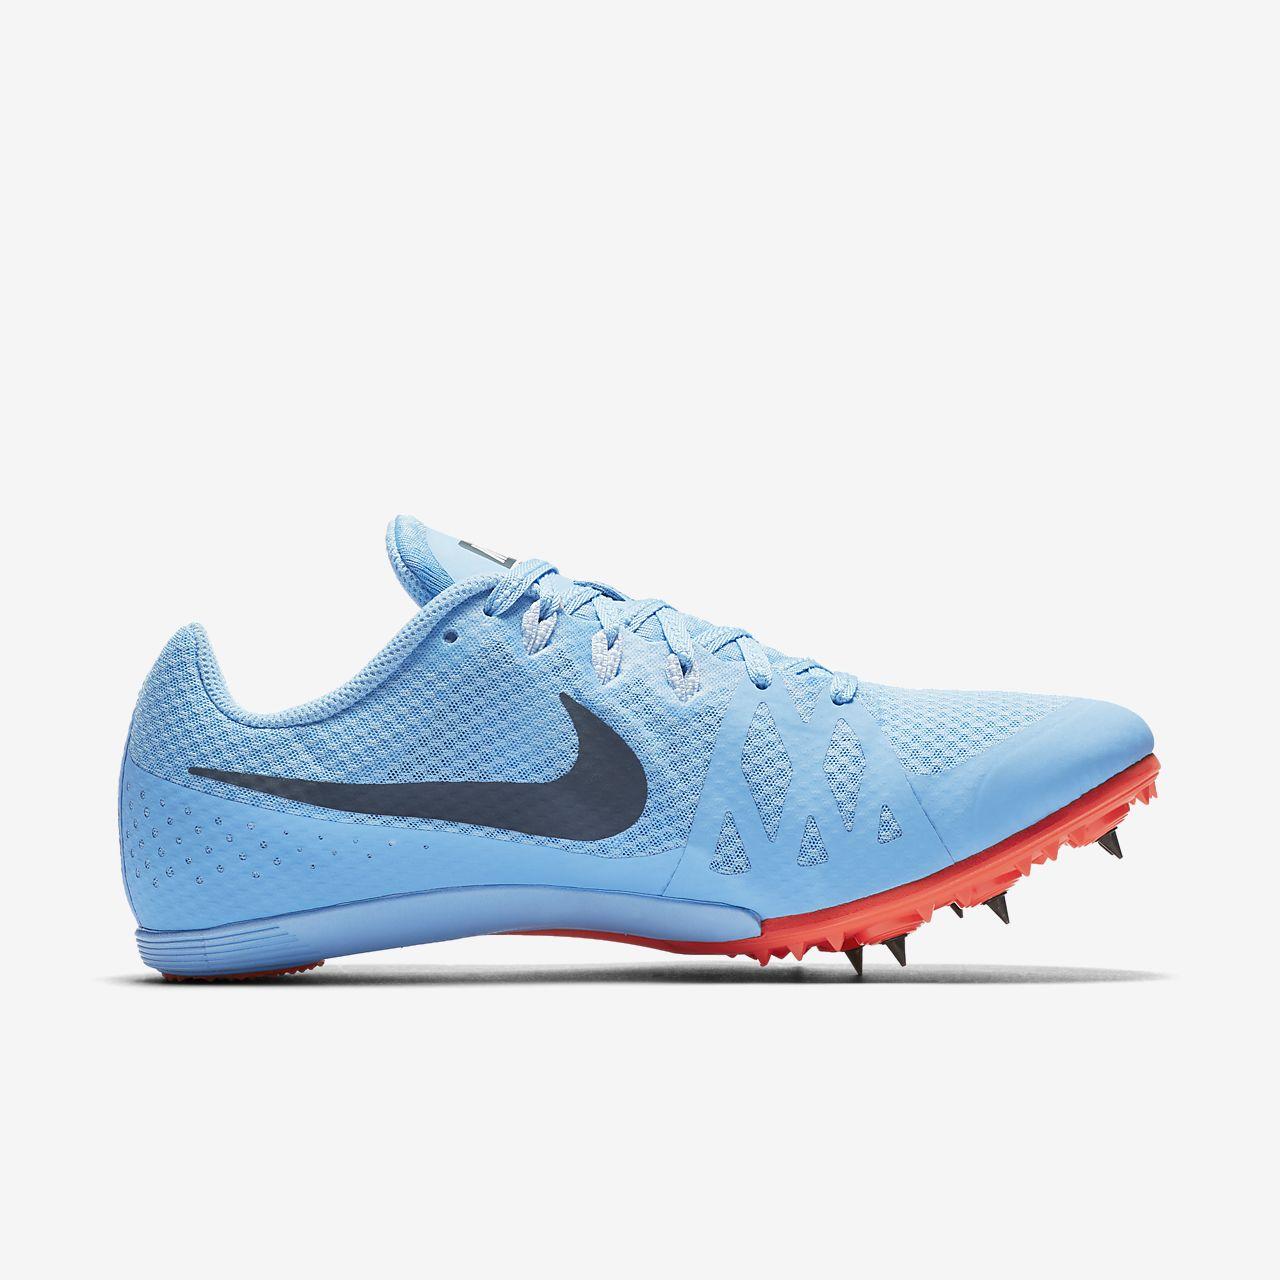 Nike Zoom Rival M 8 - O8977